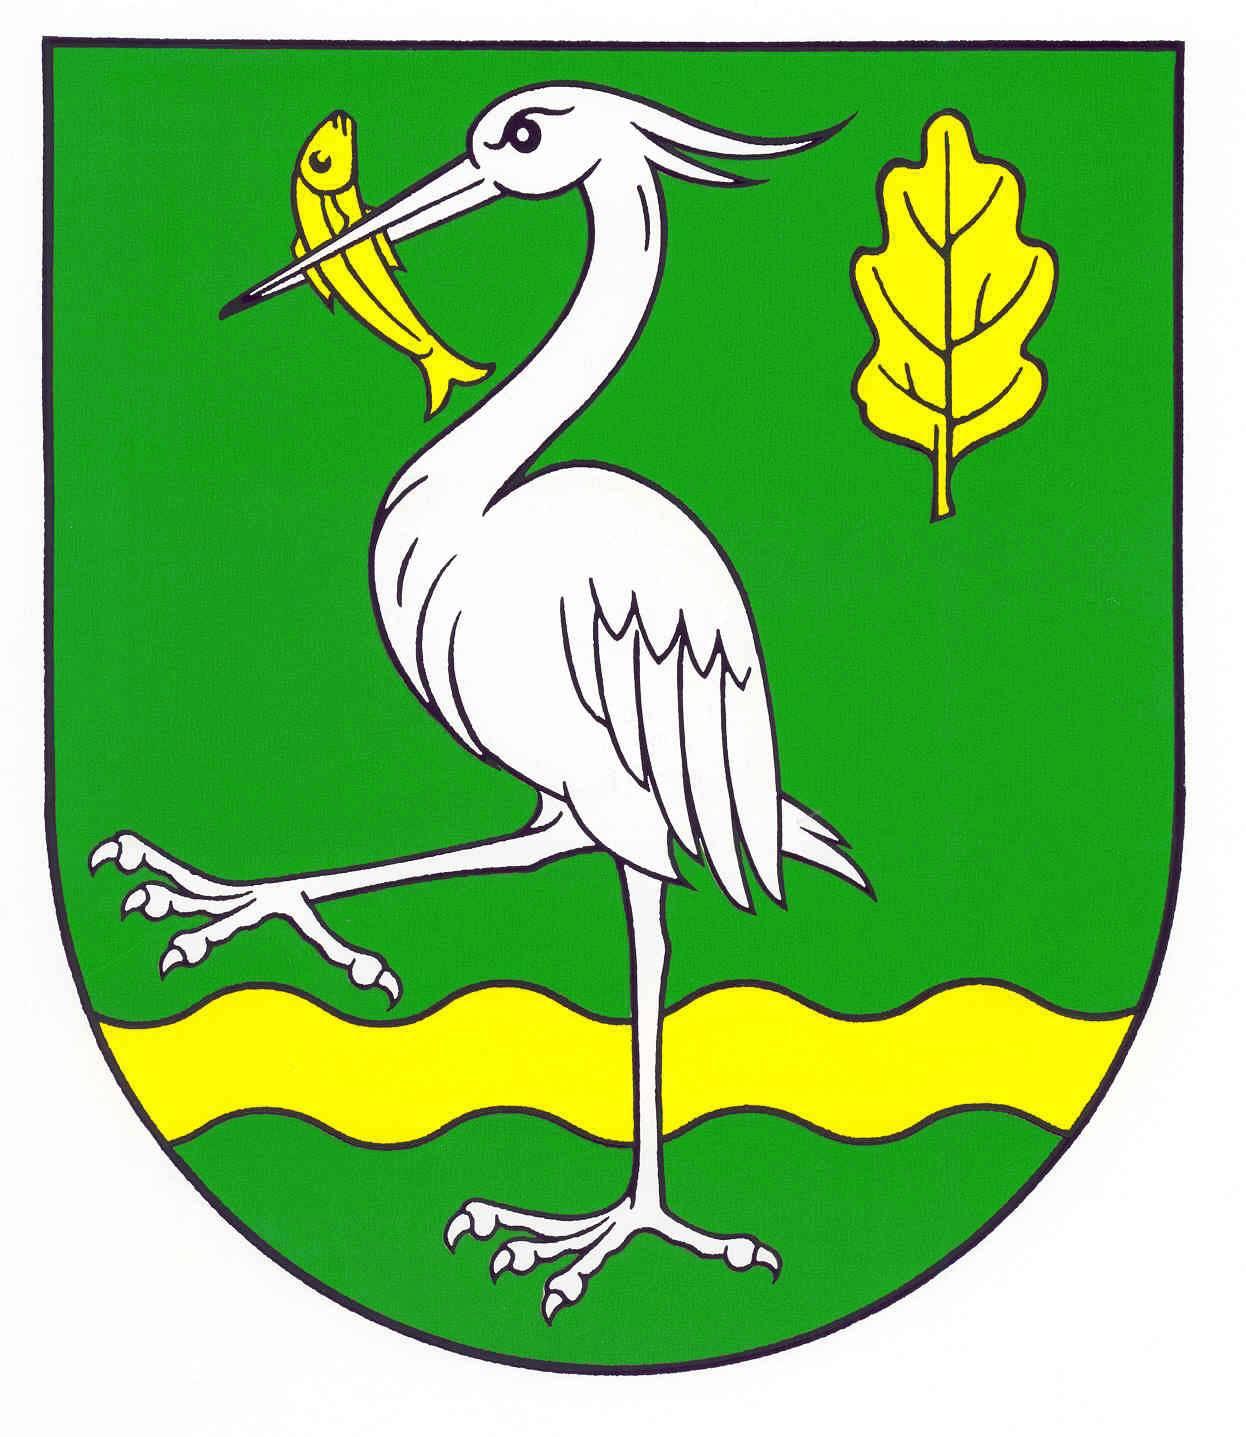 Wappen GemeindeKölln-Reisiek, Kreis Pinneberg